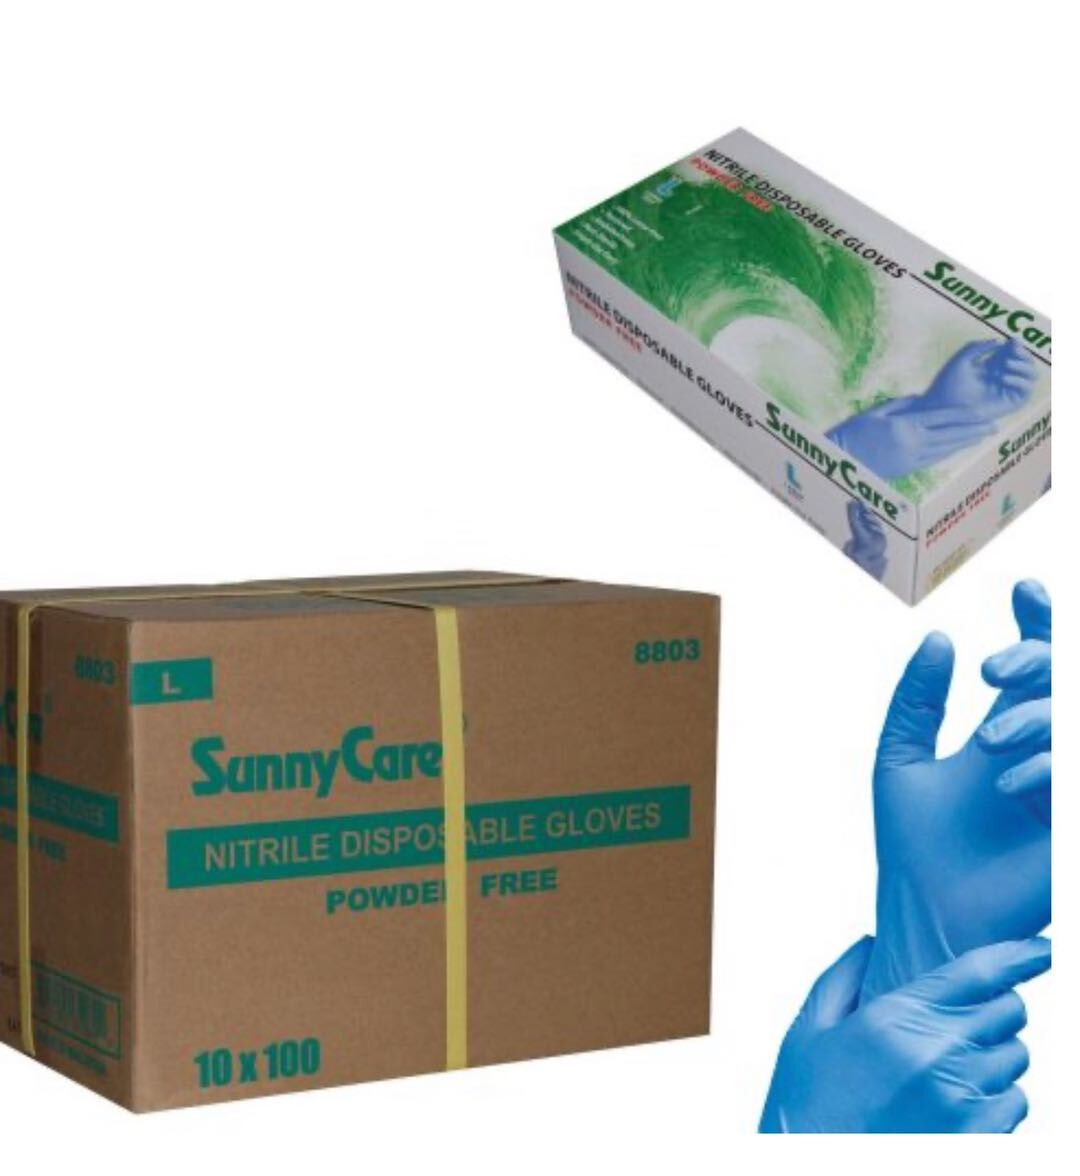 SunnyCare Glove Nitrile Non-medical, 10 boxes, 1,000pc